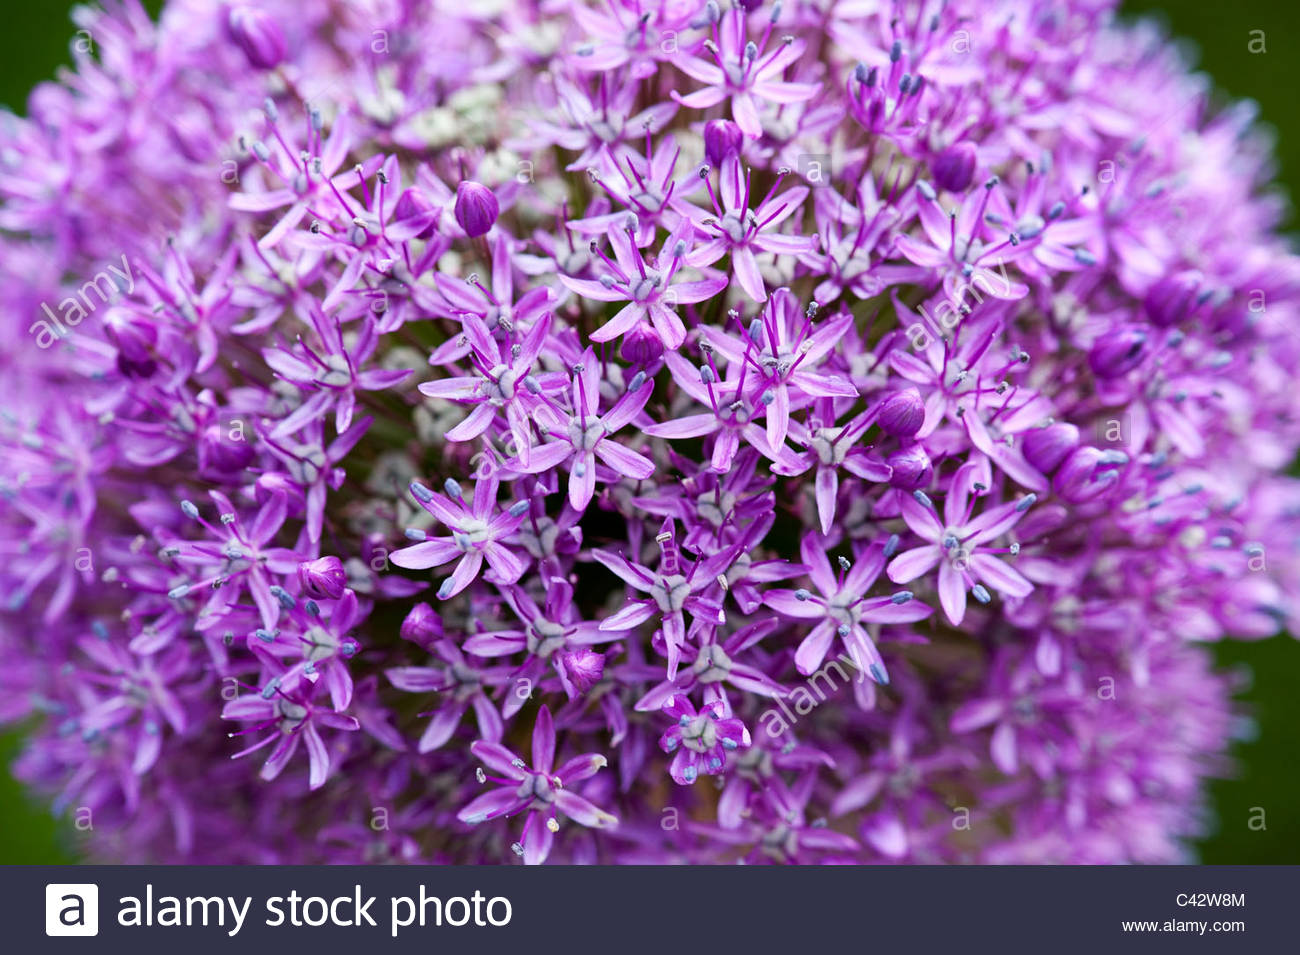 Allium 'Ambassador'. Ornament onion flower going to seed - Stock Image